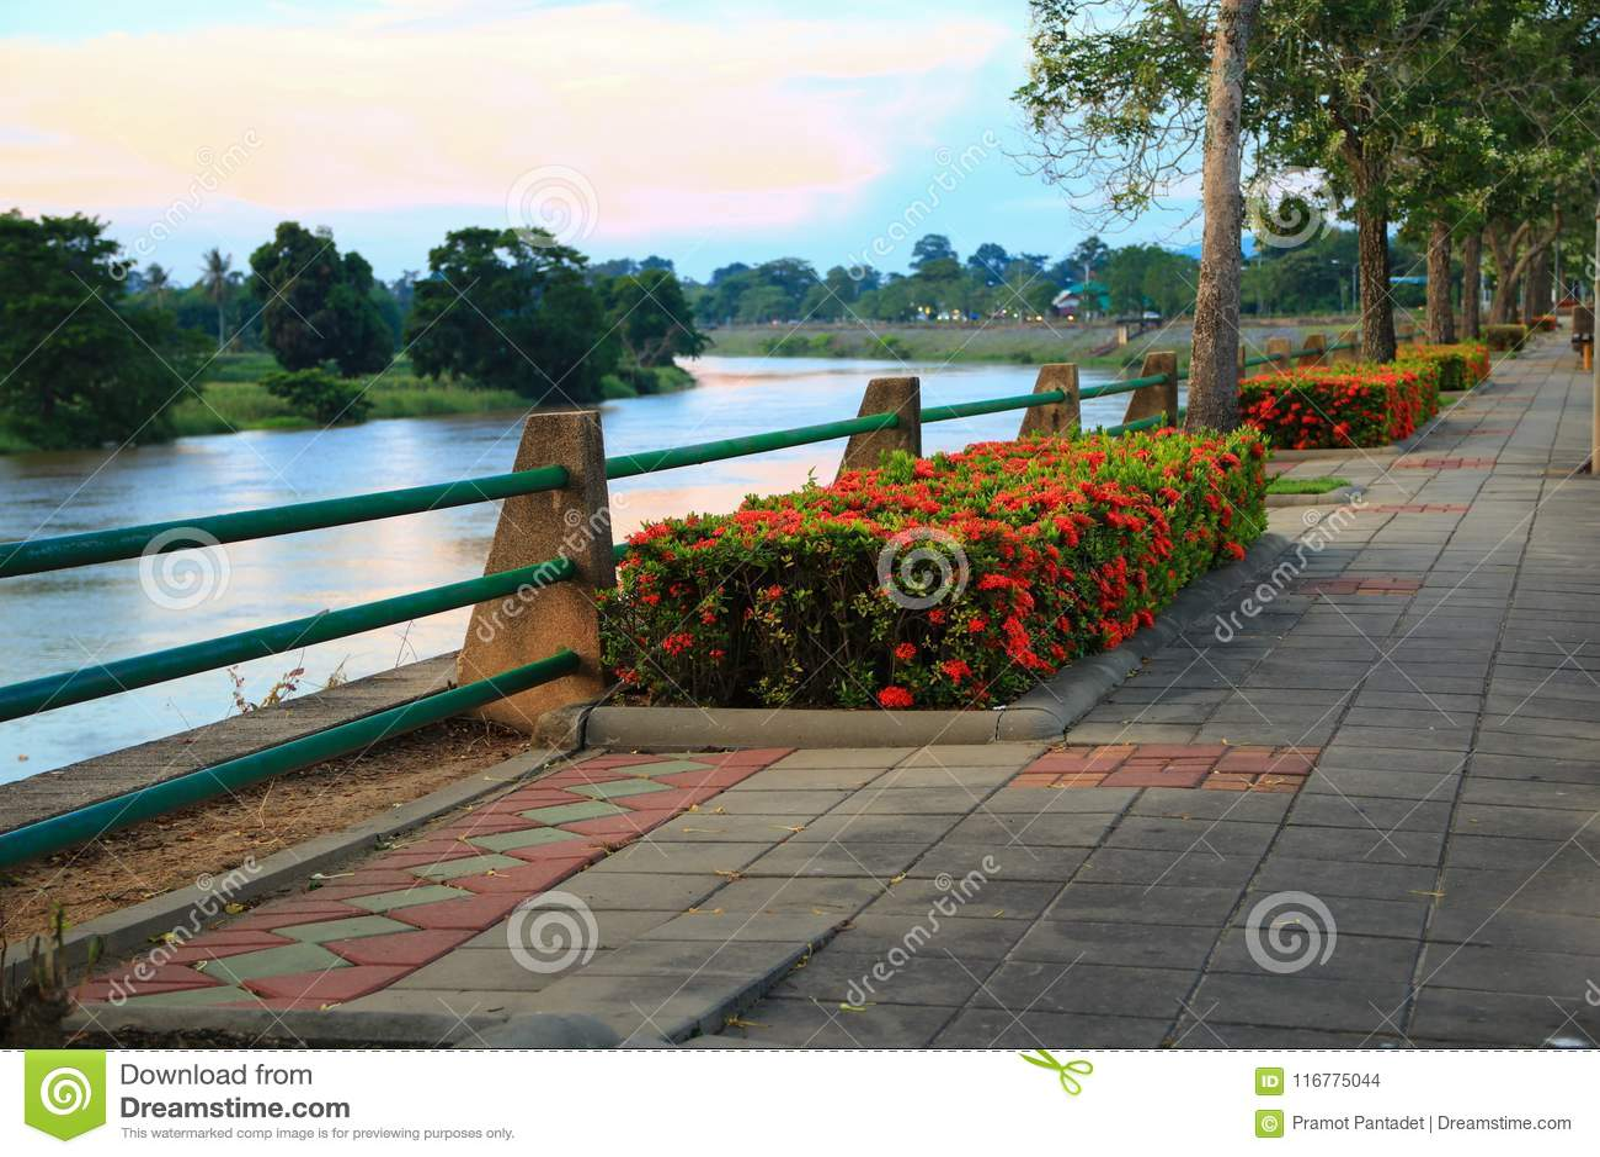 Stone block walk path riverside in the public park